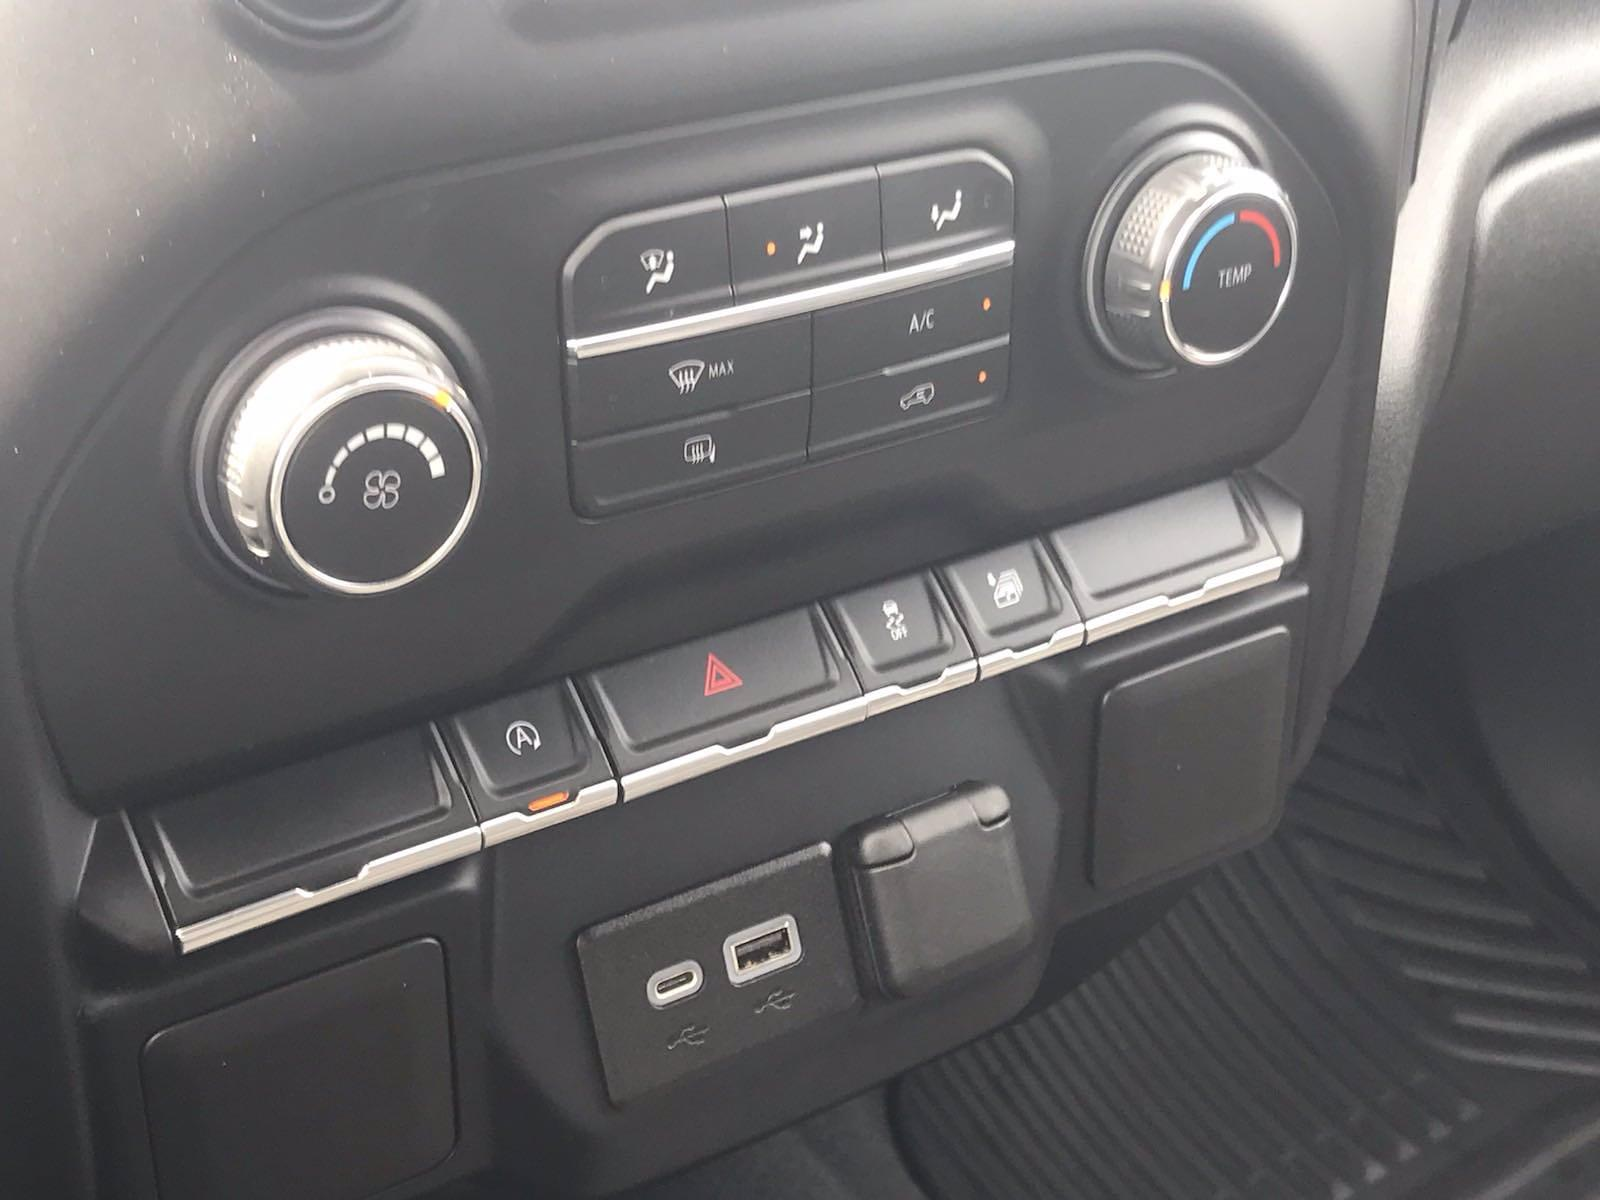 2020 Chevrolet Silverado 1500 Crew Cab 4x4, Pickup #16466PN - photo 36